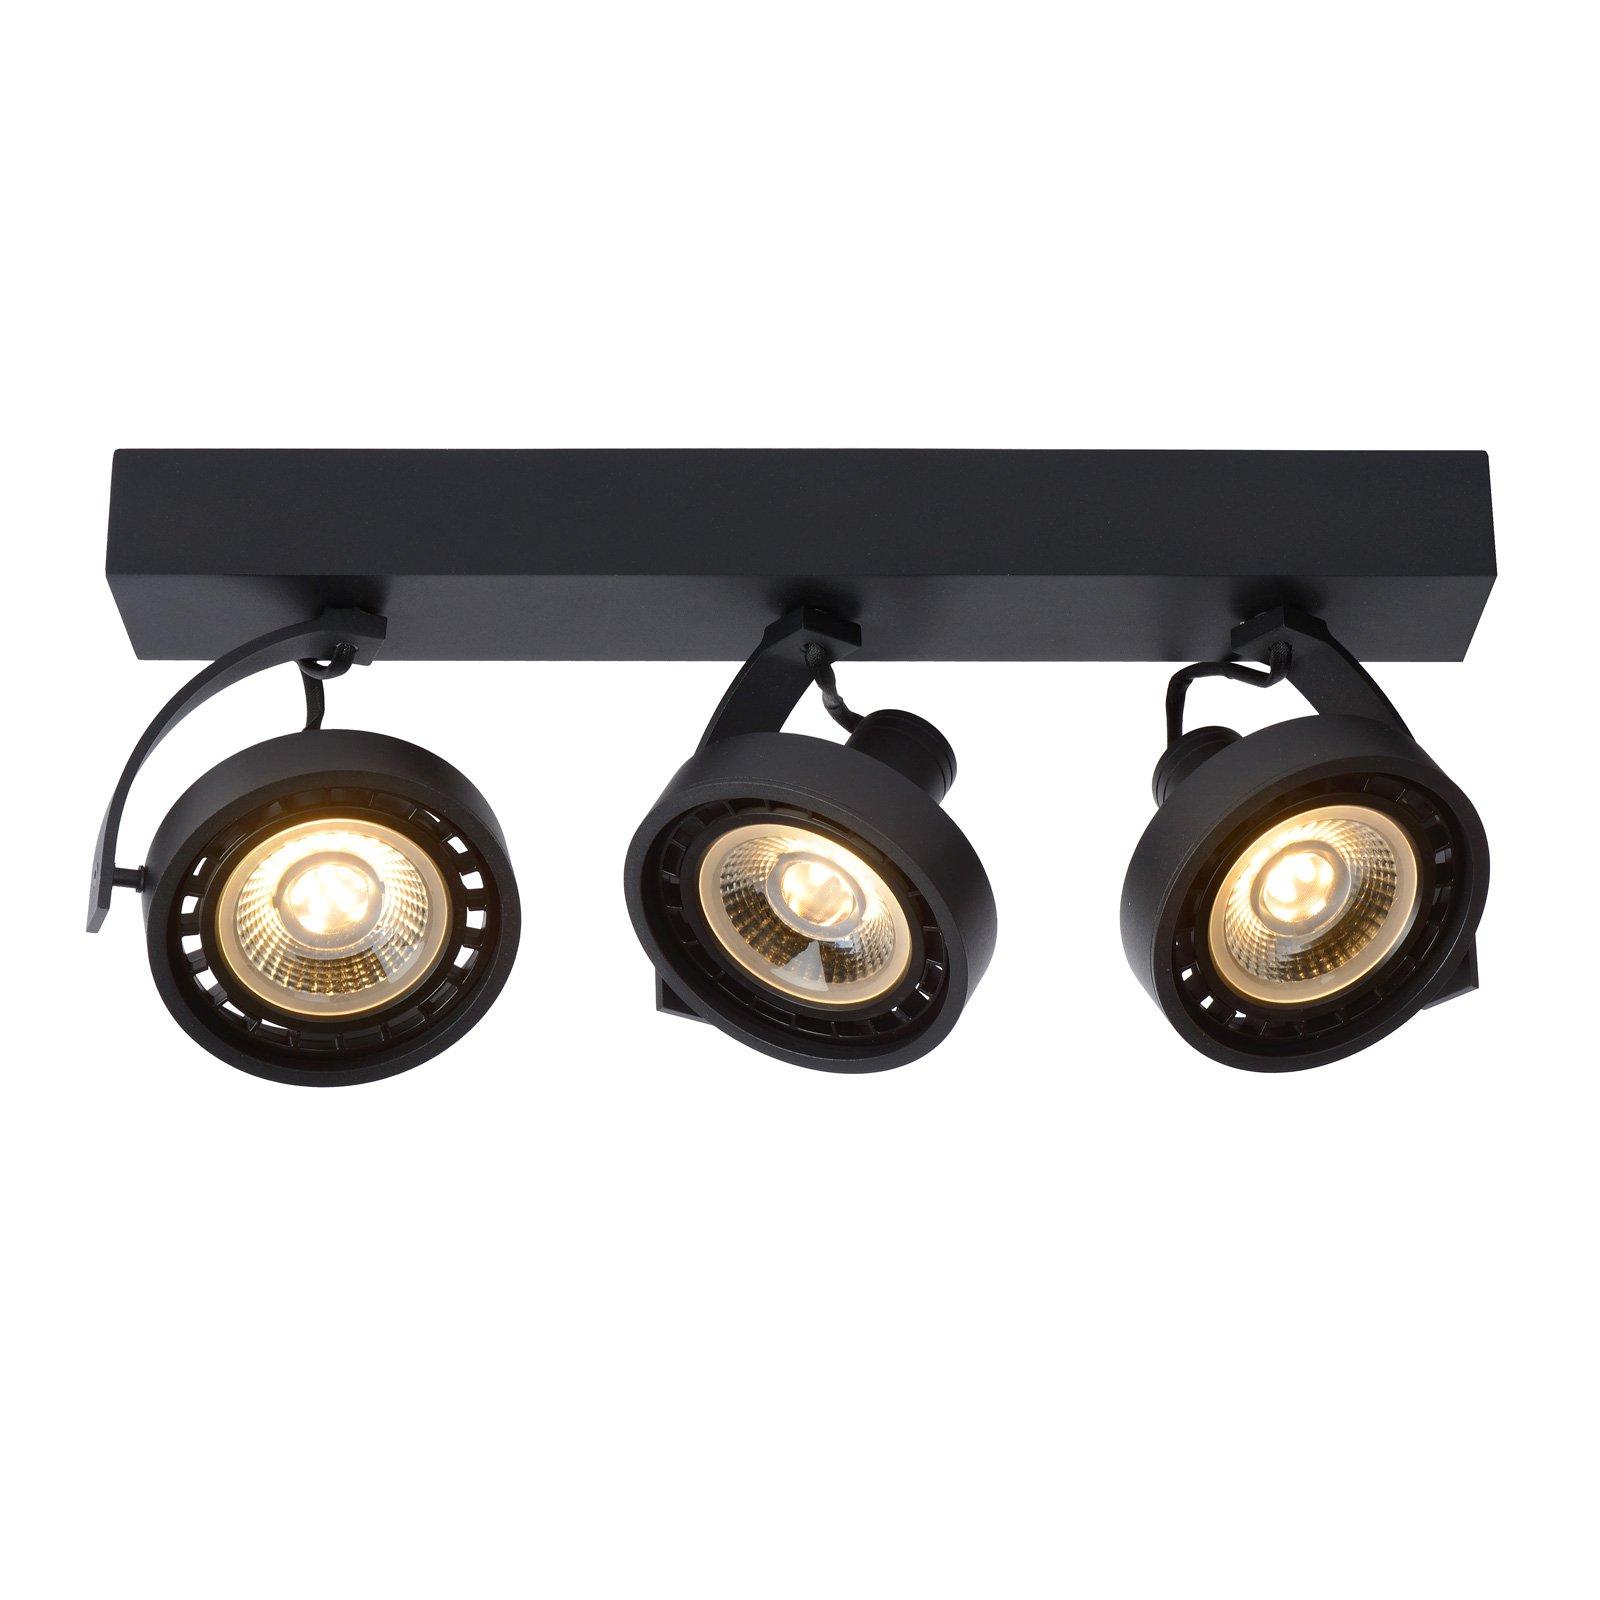 Dorian LED-takspot 3 lyskilder, dim to warm